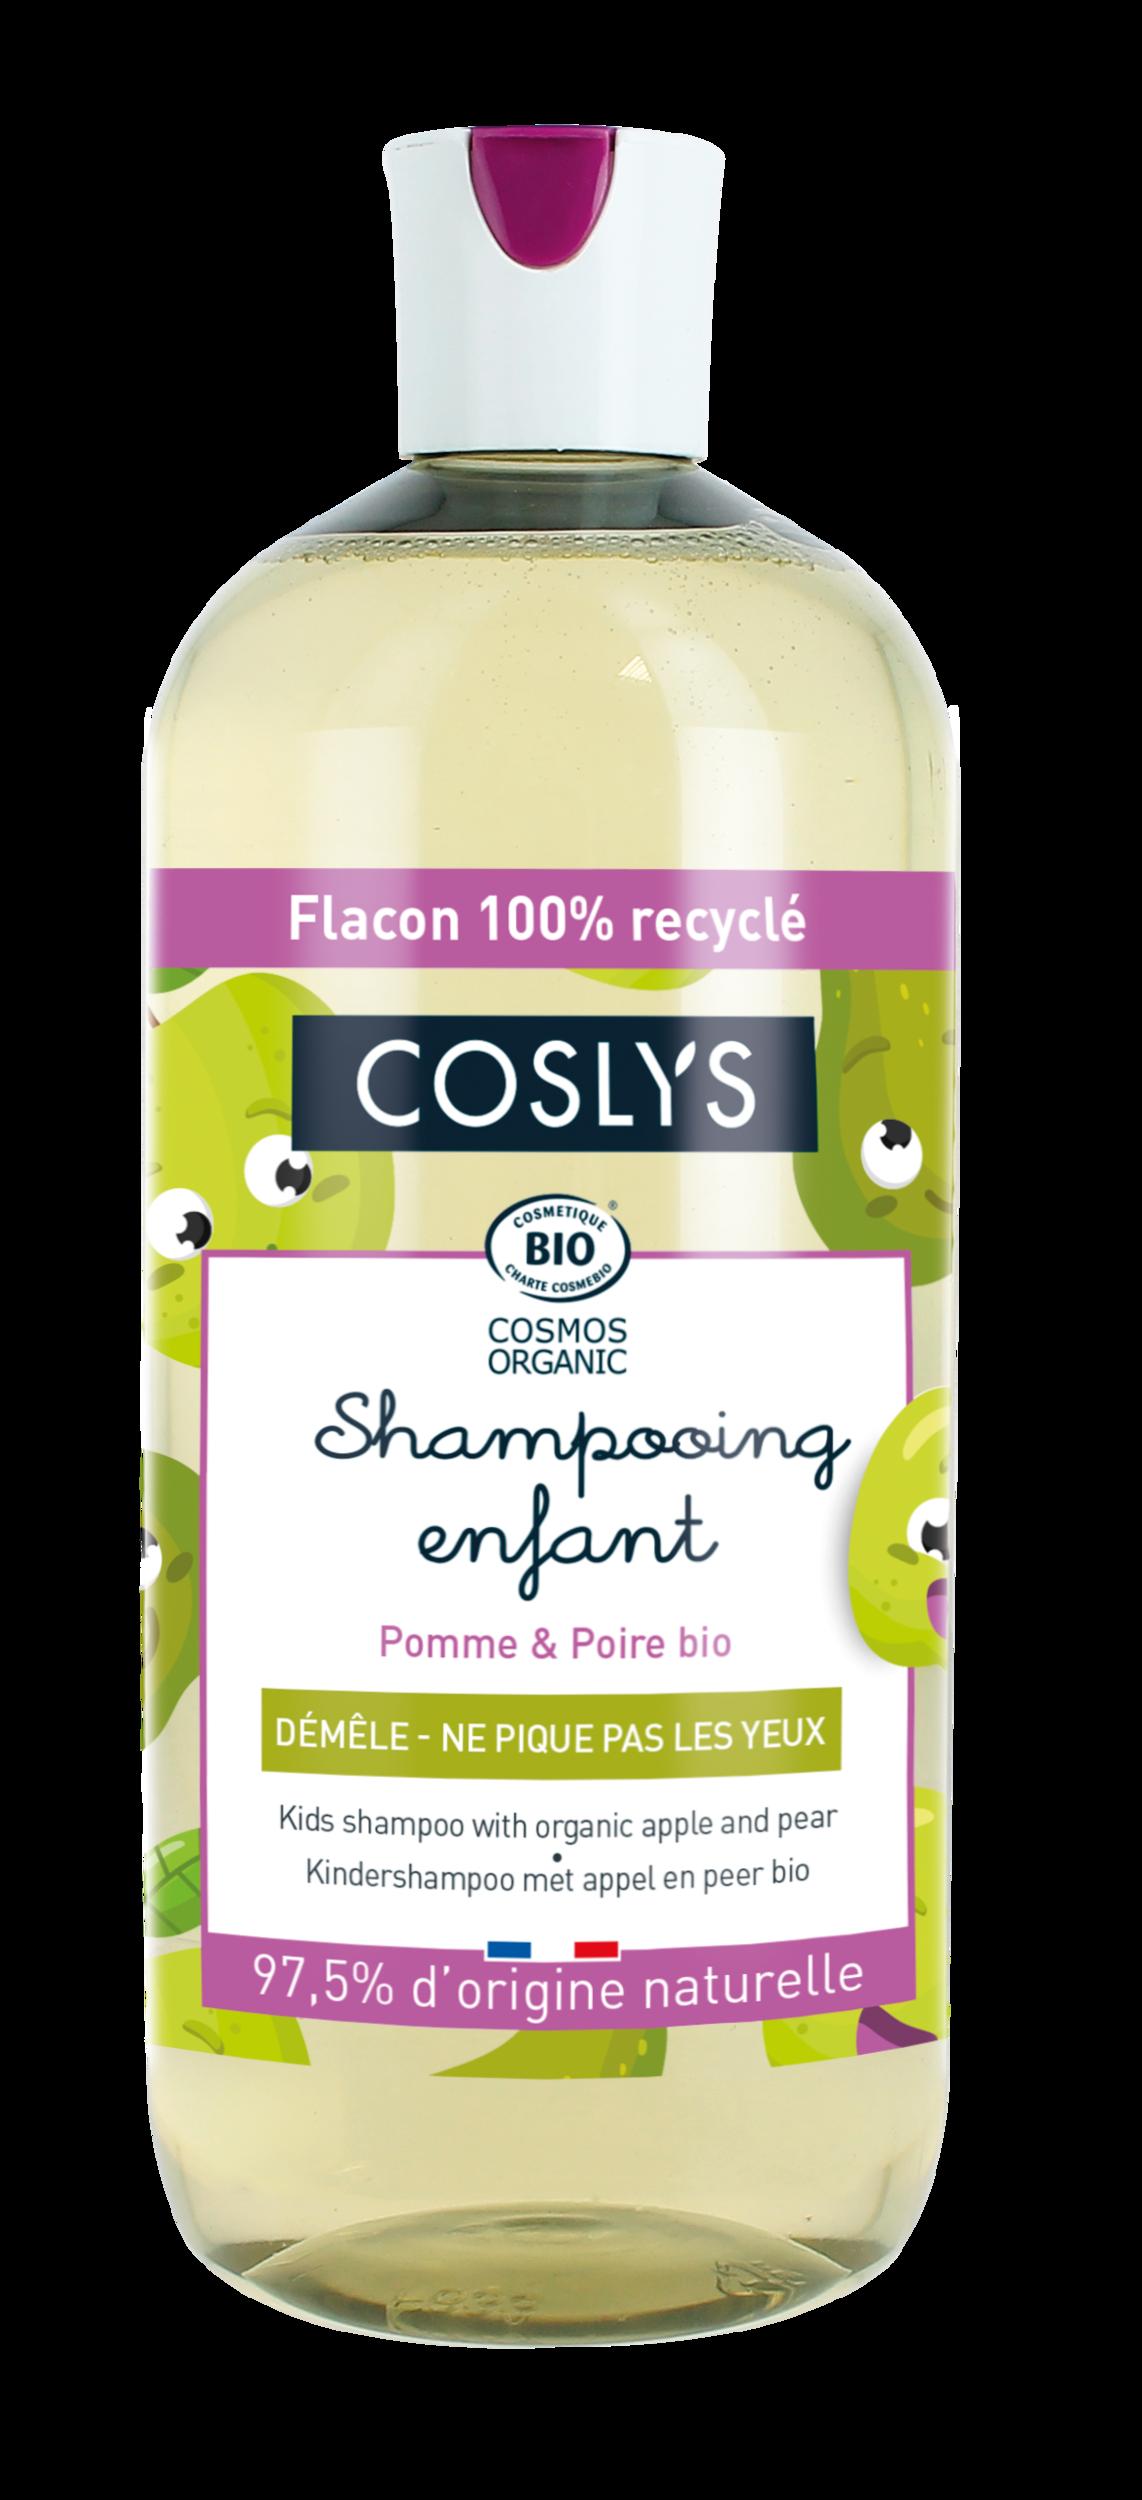 Shampoing enfant bio Coslys